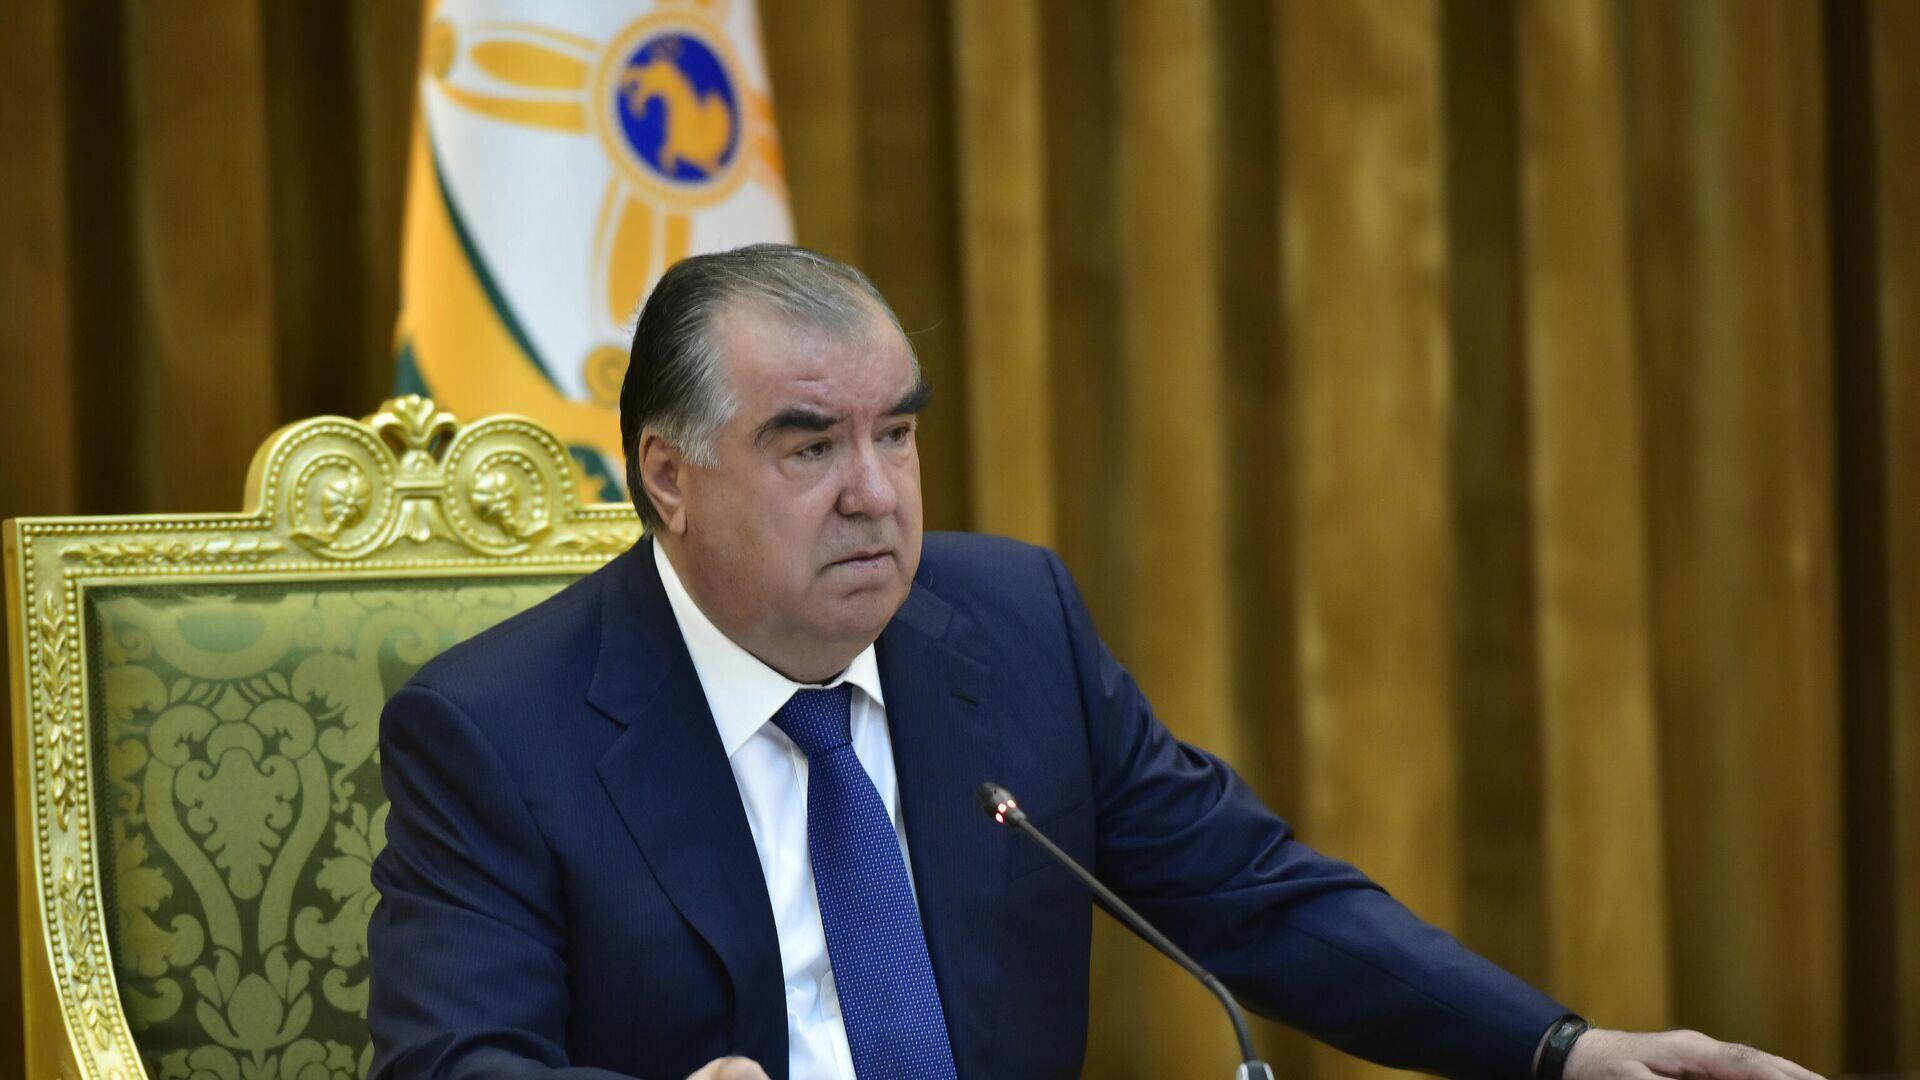 Президент Республики Таджикистан Эмомали Рахмон - Sputnik Таджикистан, 1920, 05.07.2021